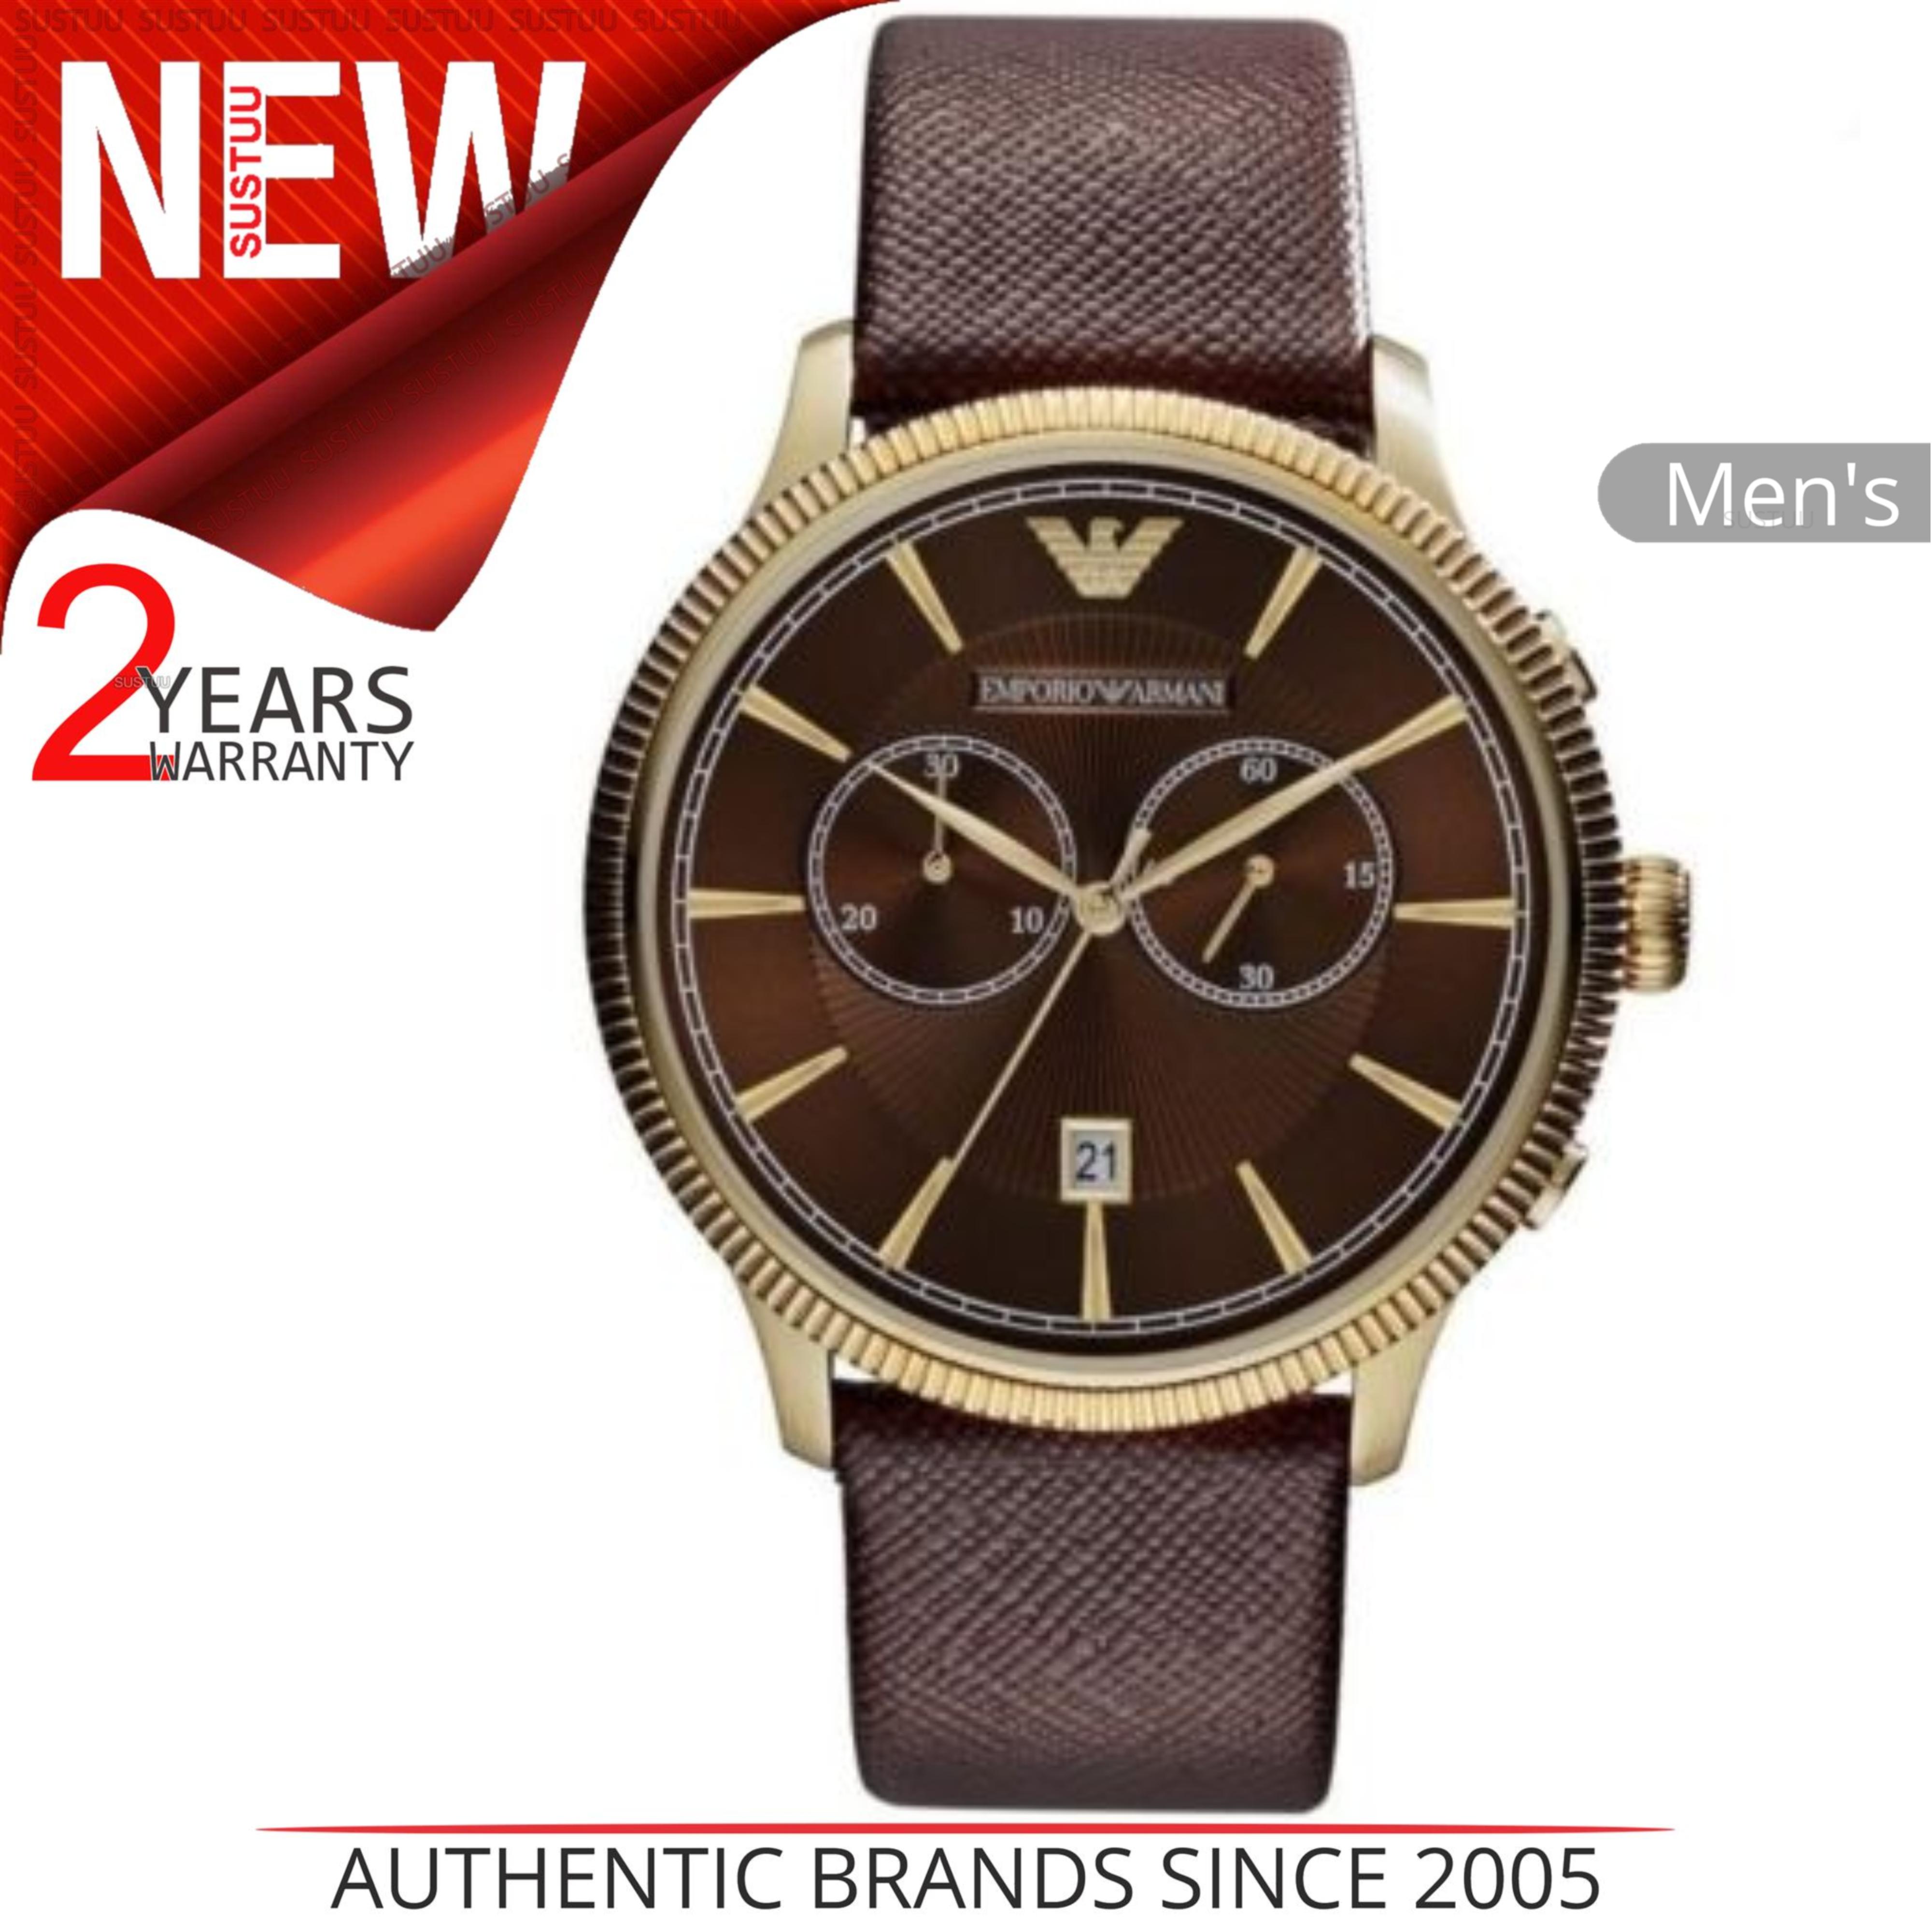 28bae7d018b0 Sentinel Emporio Armani Classic Men s Watch│Chrono Brown Dial│Brown Leather  Strap│AR1793